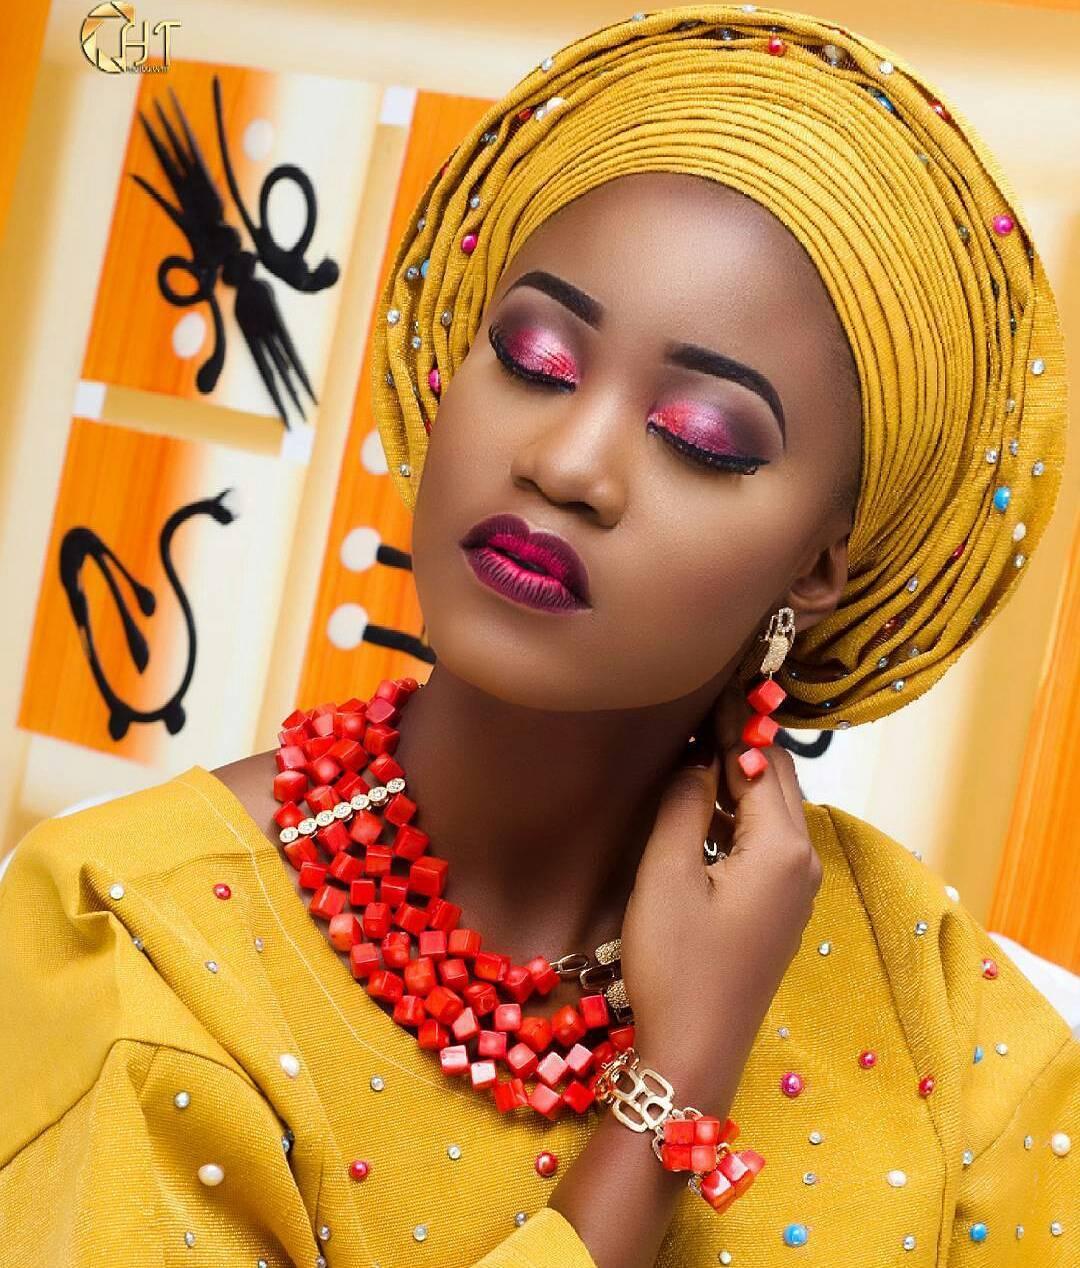 Imagecredit Www Fashionpolice Com Kamdora